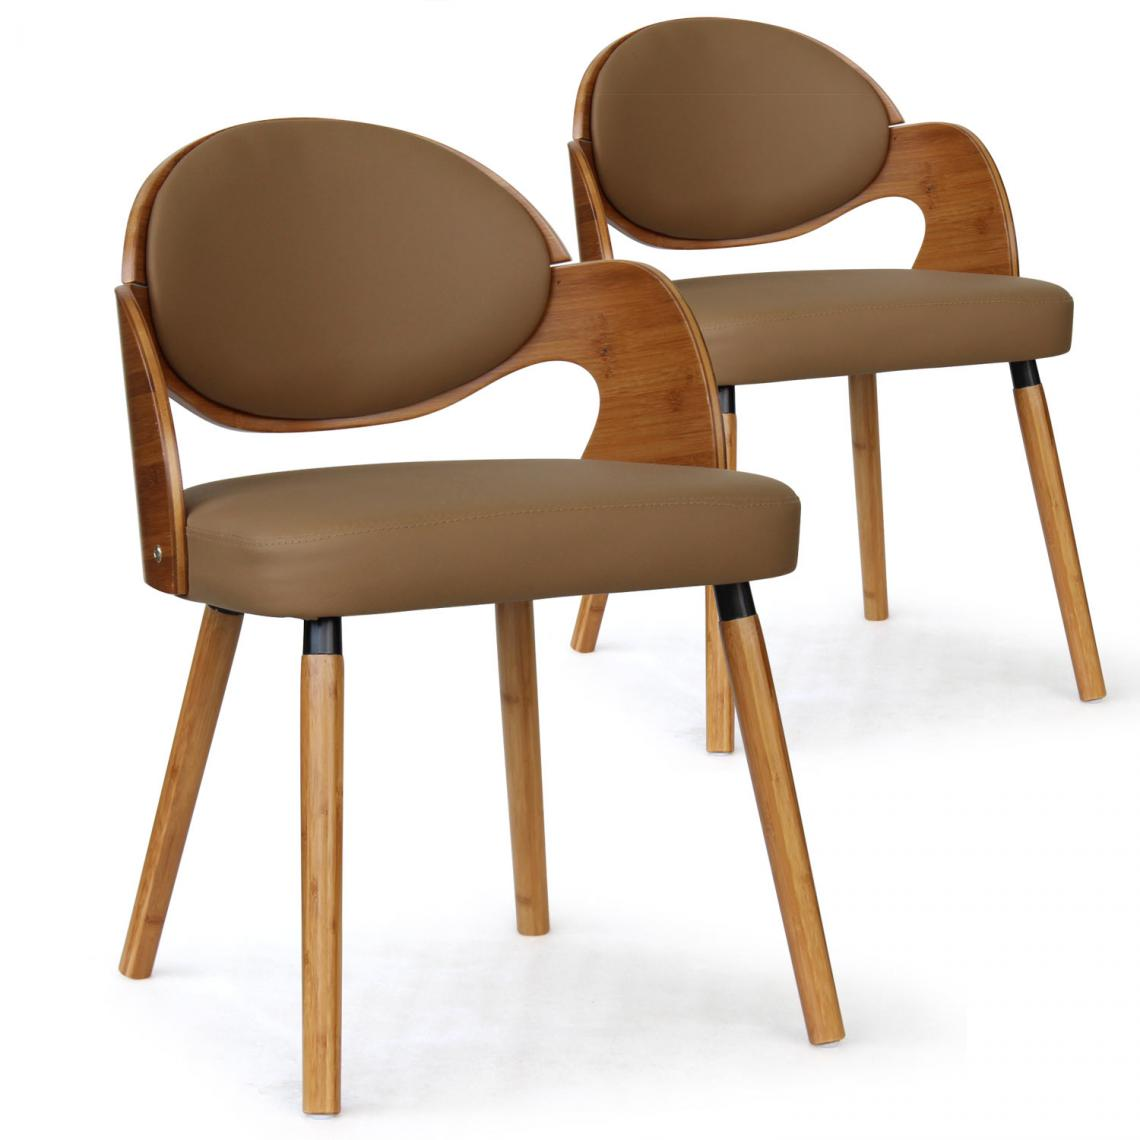 lot de 2 chaises scandinaves chene clair taupe alsea